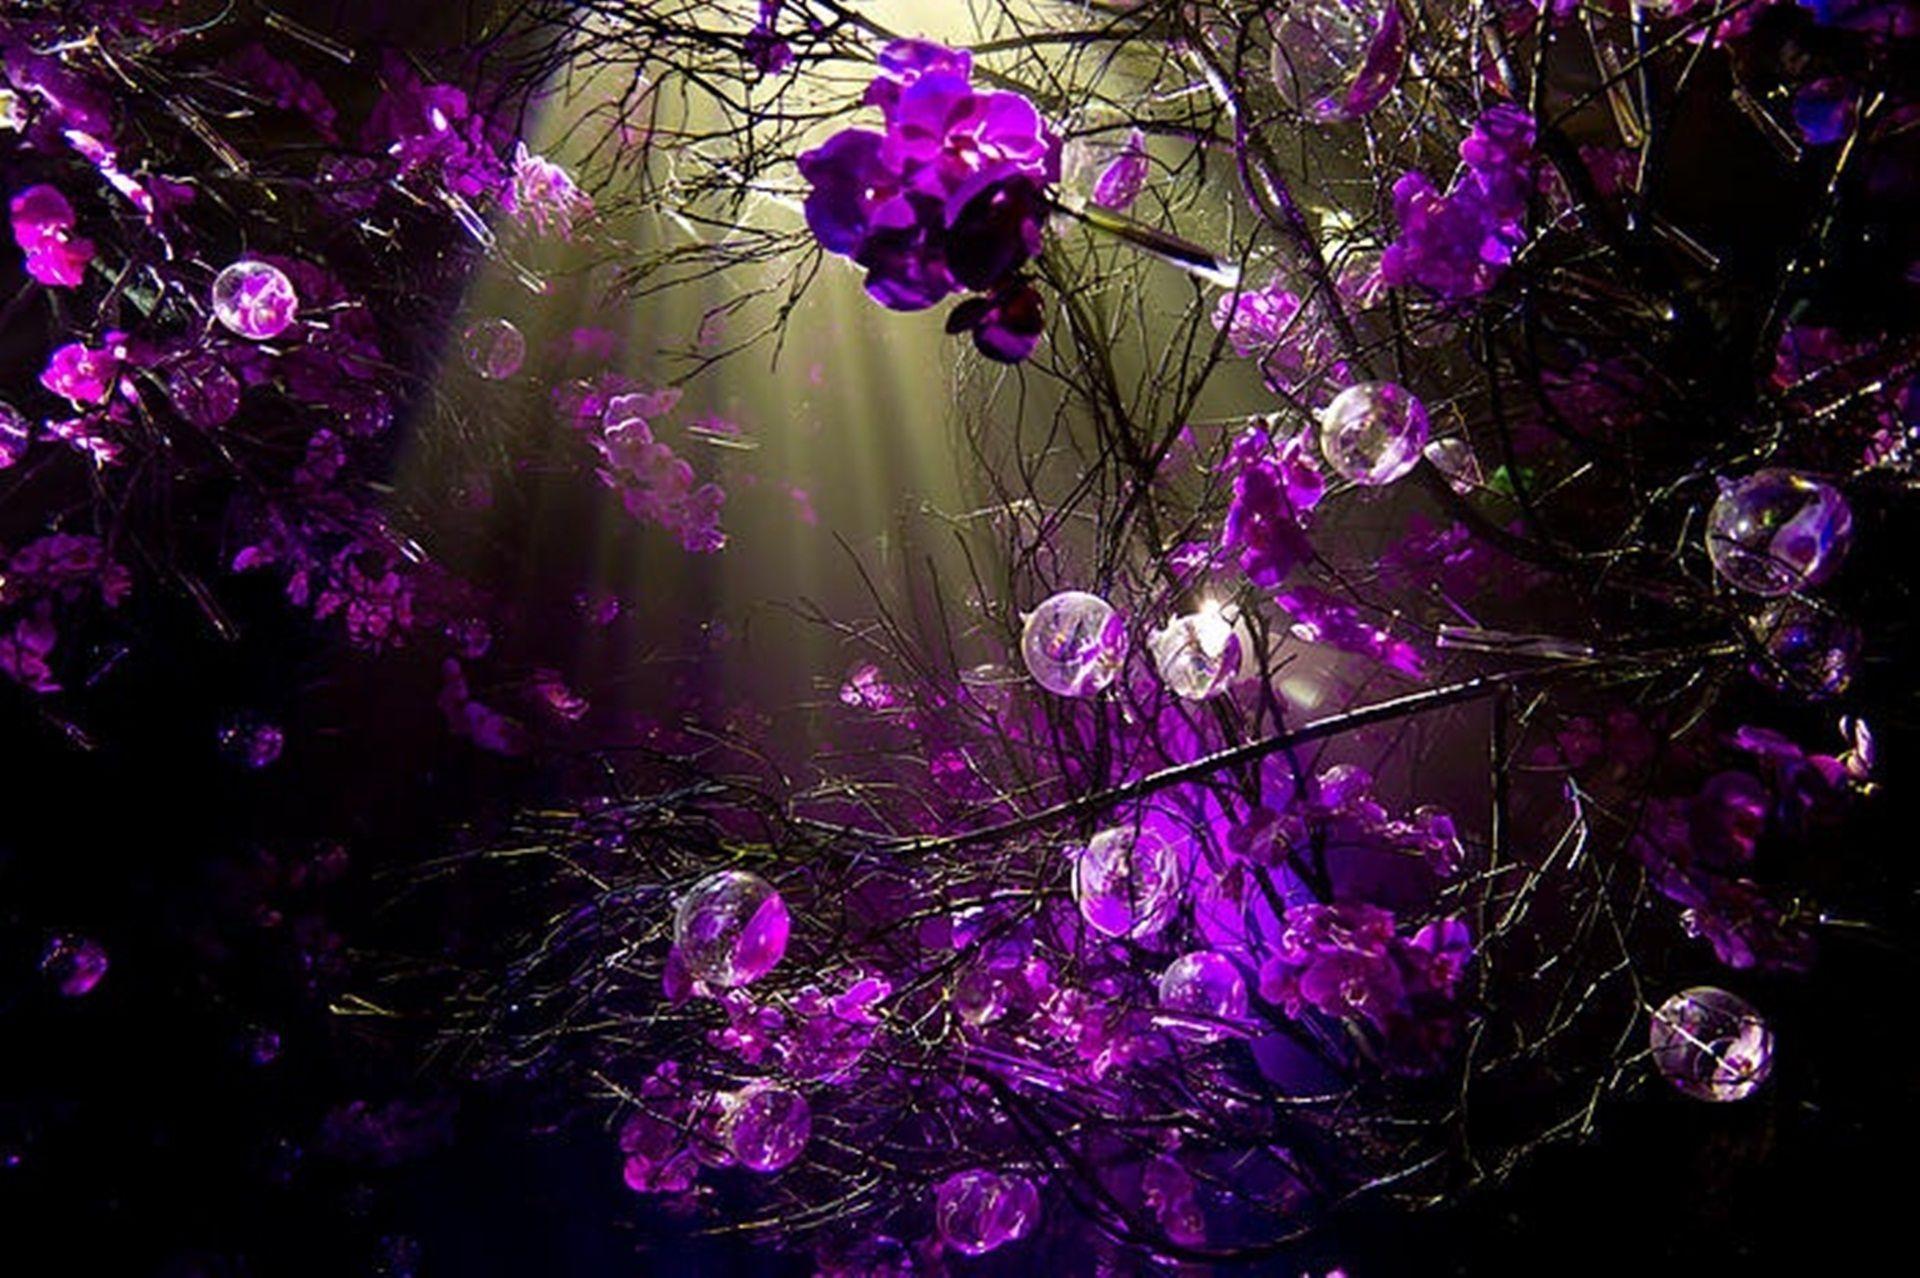 Purple Desktop Wallpapers - Top Free